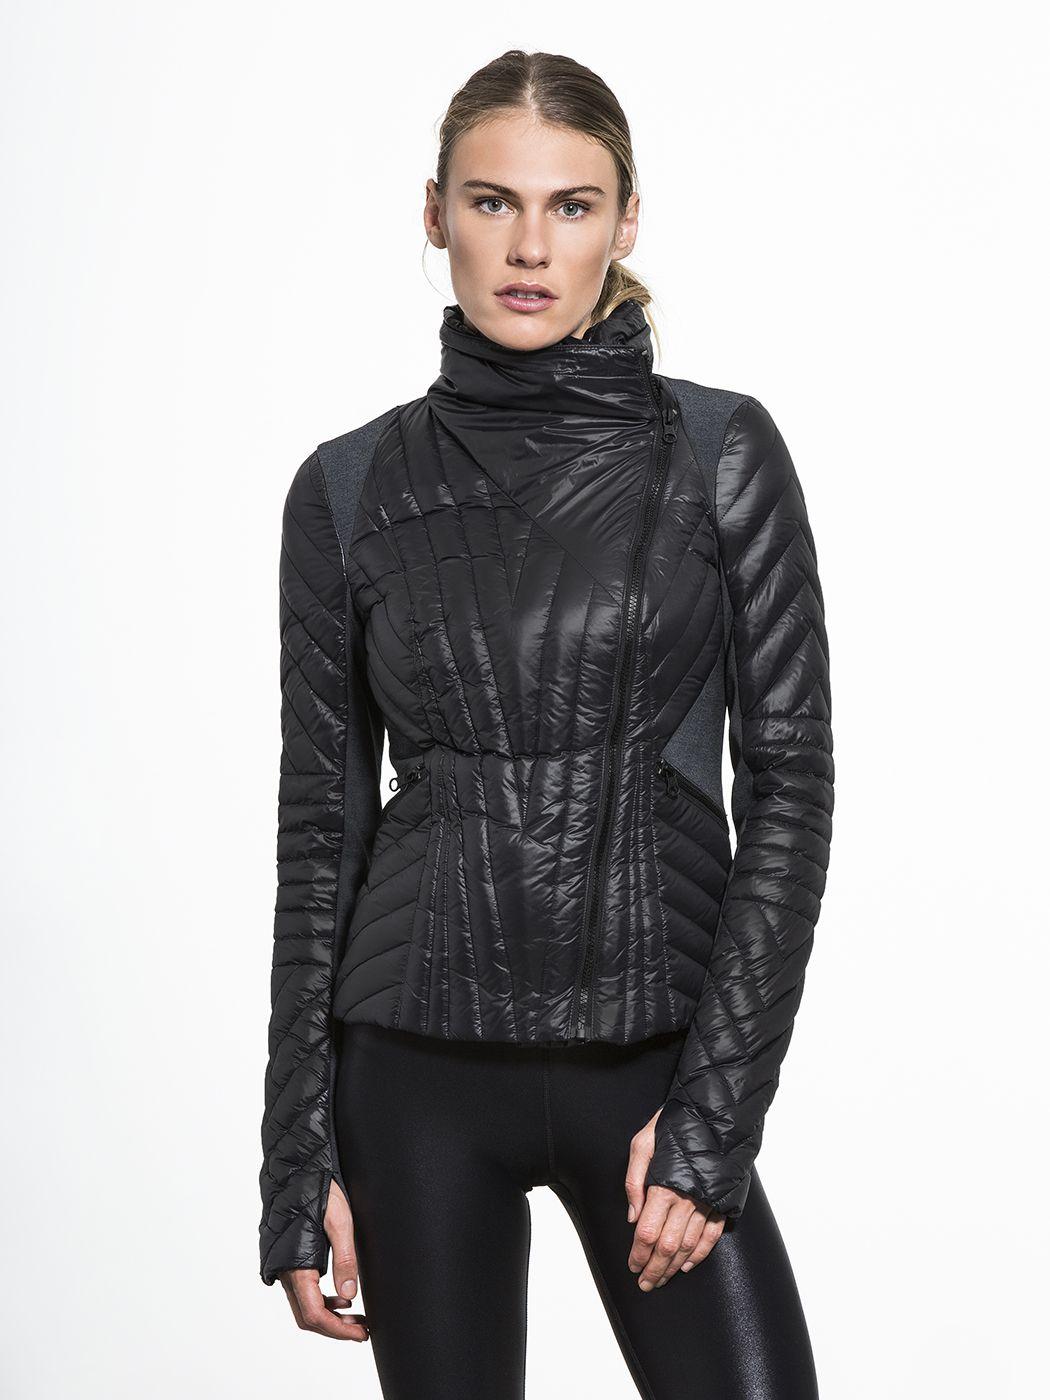 Blanc Noir Motion Panel Puffer Sports Attire Jackets Activewear Fashion [ 1400 x 1050 Pixel ]